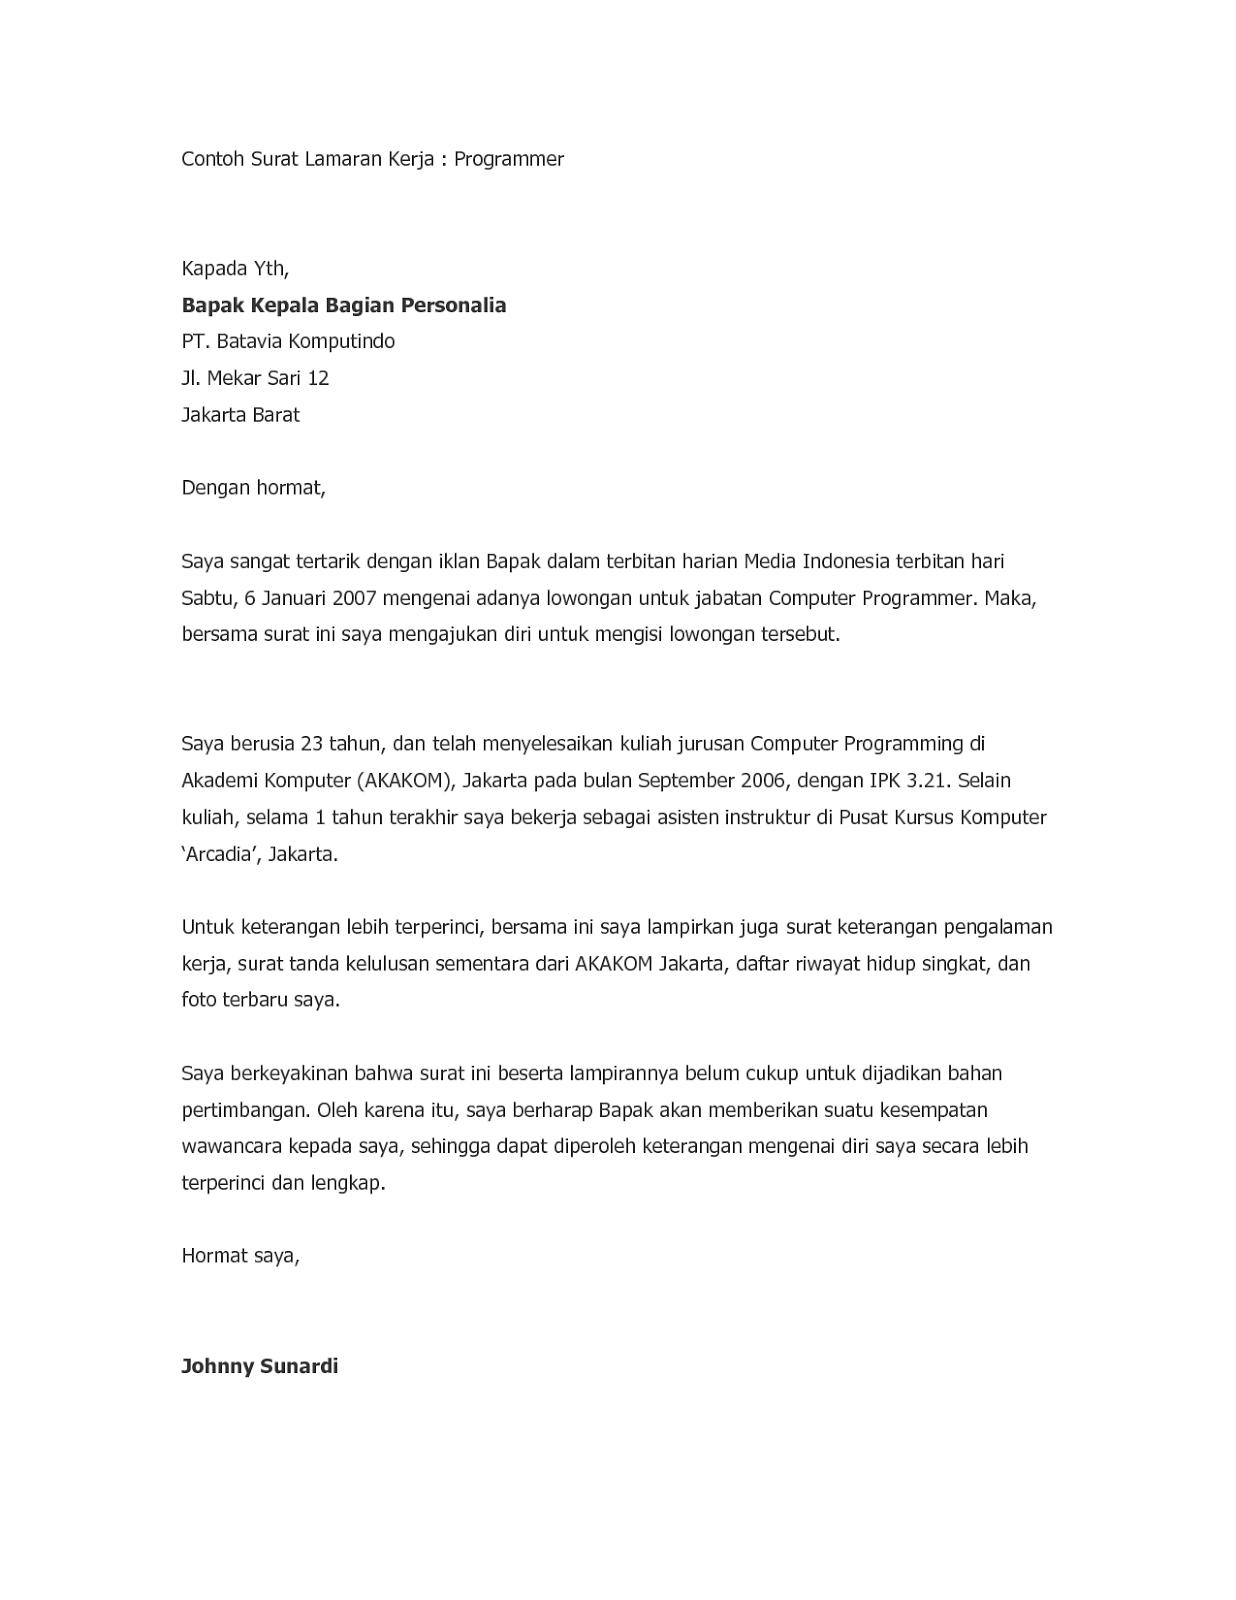 Contoh Surat Lamaran Kerja Application Letter